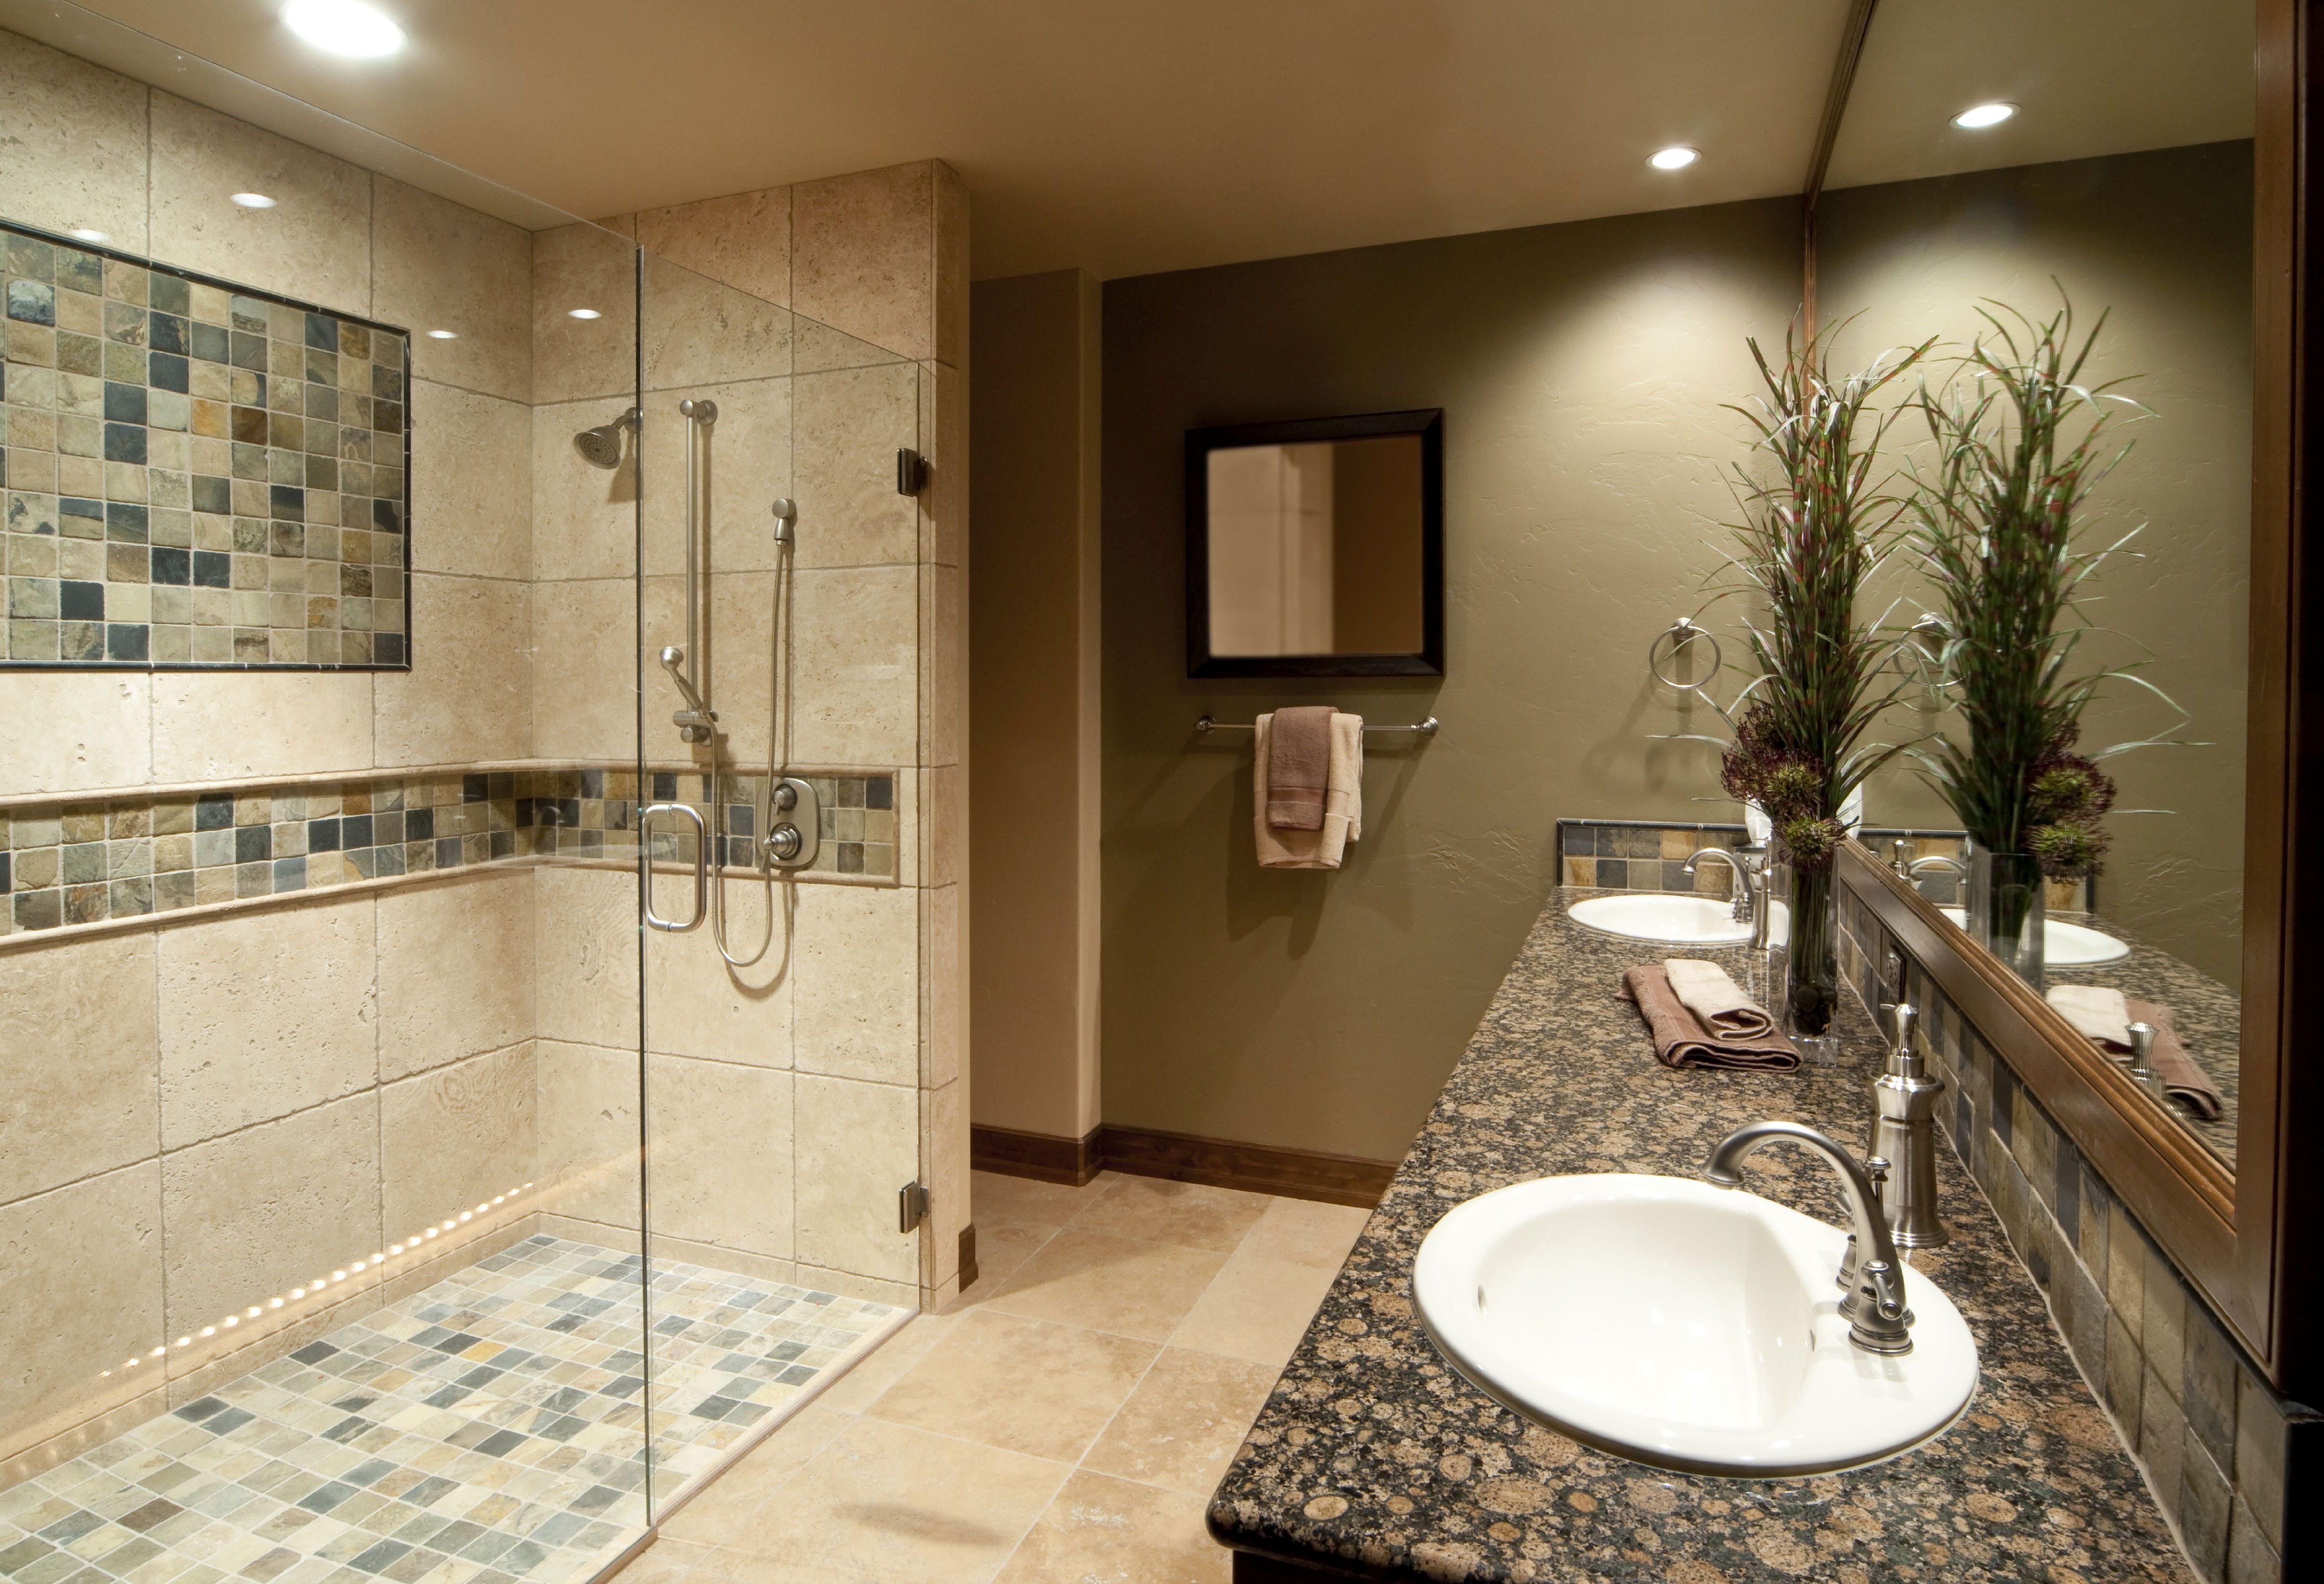 Generous Dual Bathroom Sink Small Mosaic Bathrooms Design Clean Ceramic Tile Design For Bathroom Walls Bathroom Tile Colors And Designs Old Walk In Bathtubs For Seniors BlackAda Compliant Bathroom Remodel 1000  Images About Bathroom On Pinterest | Contemporary Bathrooms ..